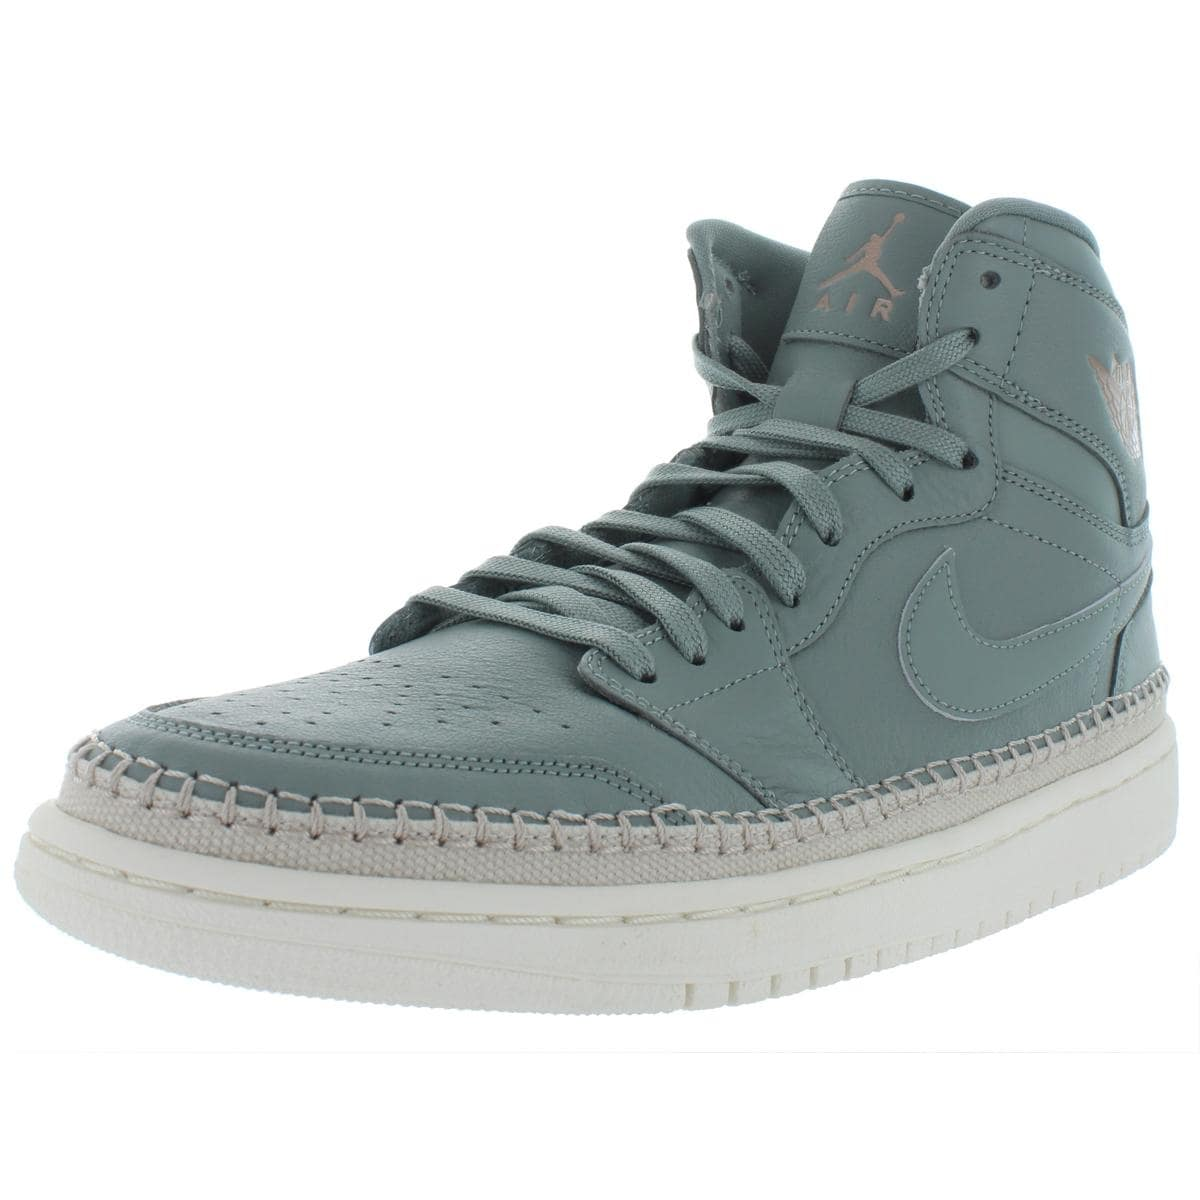 official photos 8a011 a8b6f Jordan Womens Air Jordan 1 Retro Hi Premium Basketball Shoes Leather  Signature